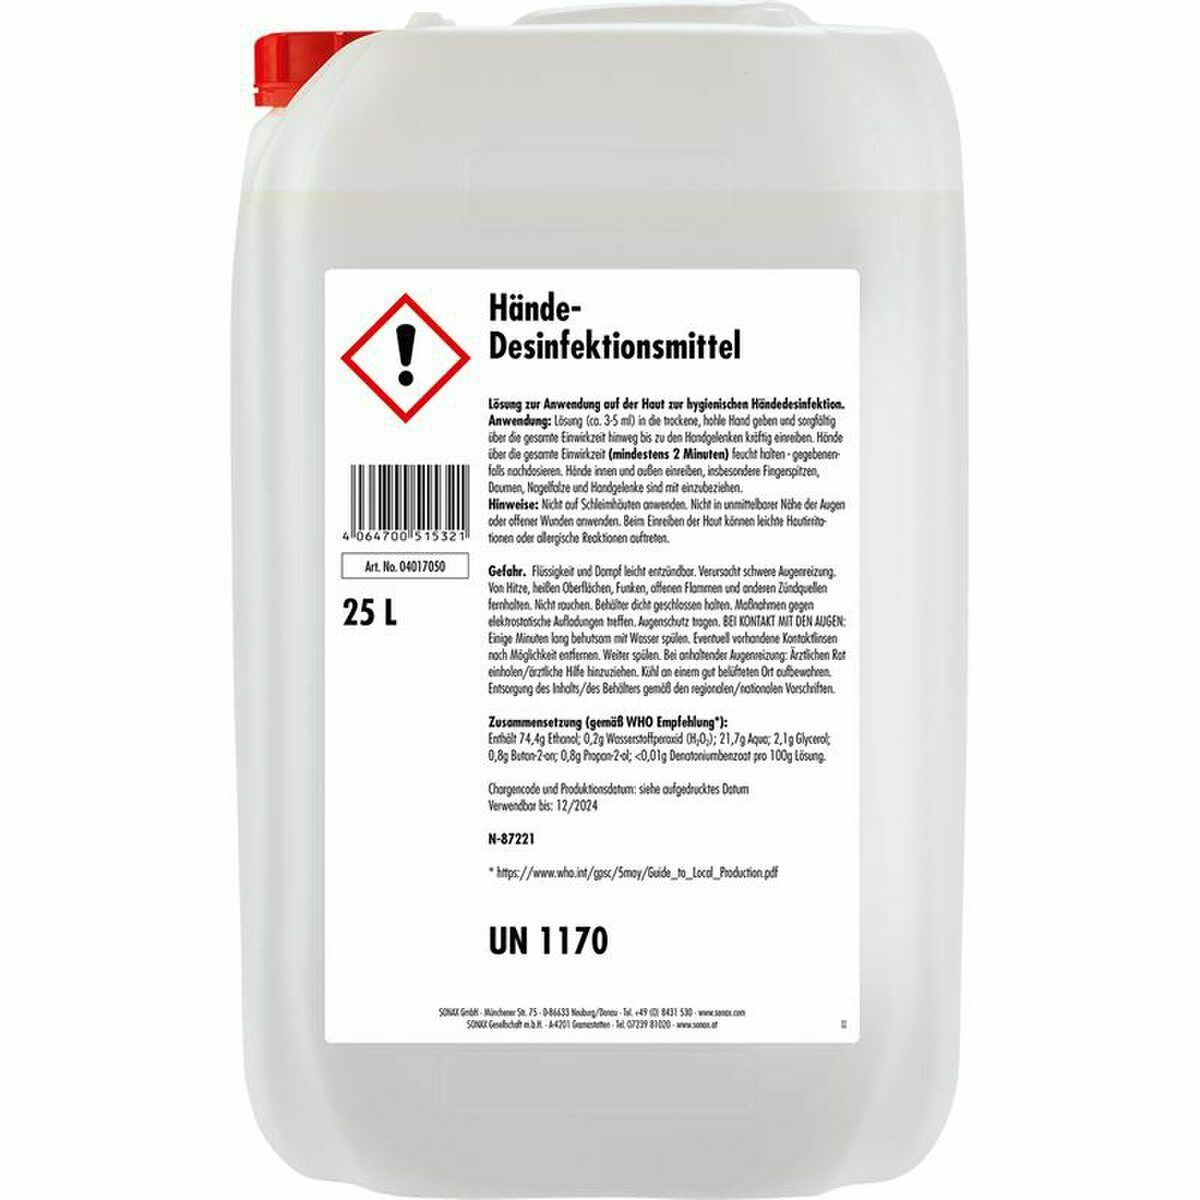 Hand-Desinfektionsmittel 25L-Kanister - SONAX®